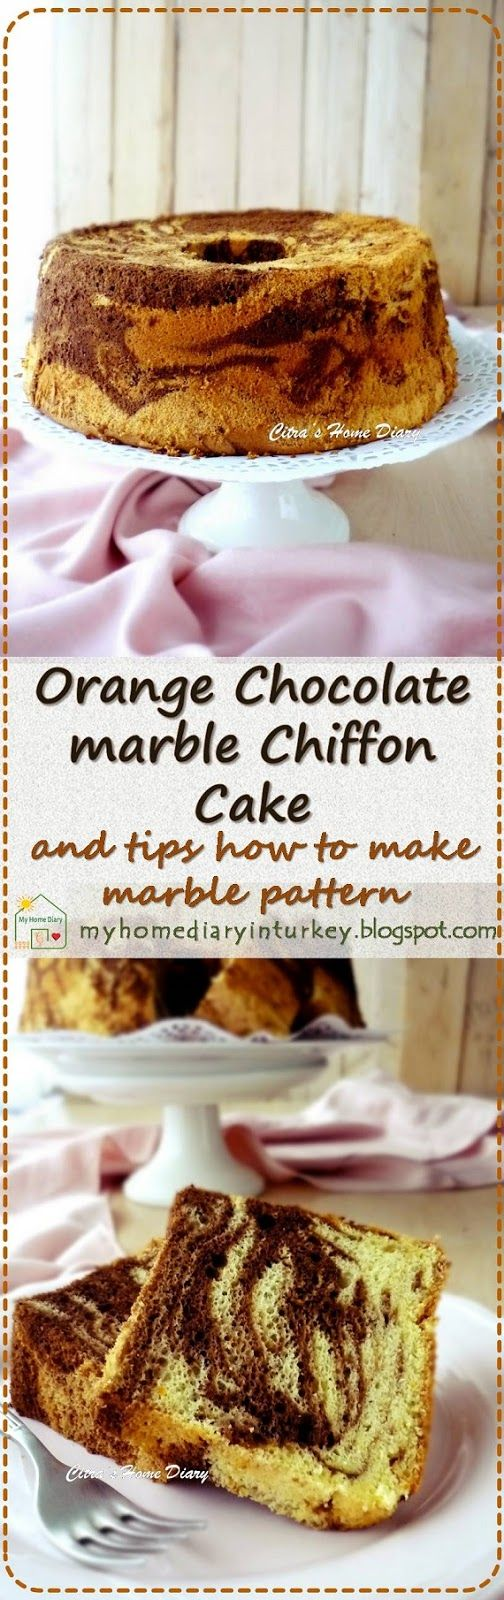 Orange Chocolate marble Chiffon Cake and tips how to make marble pattern-Çitra'sHomeDiary. #chiffoncake #marblecake #kekmarmer #chocolatecake #orangecake #orangechiffon